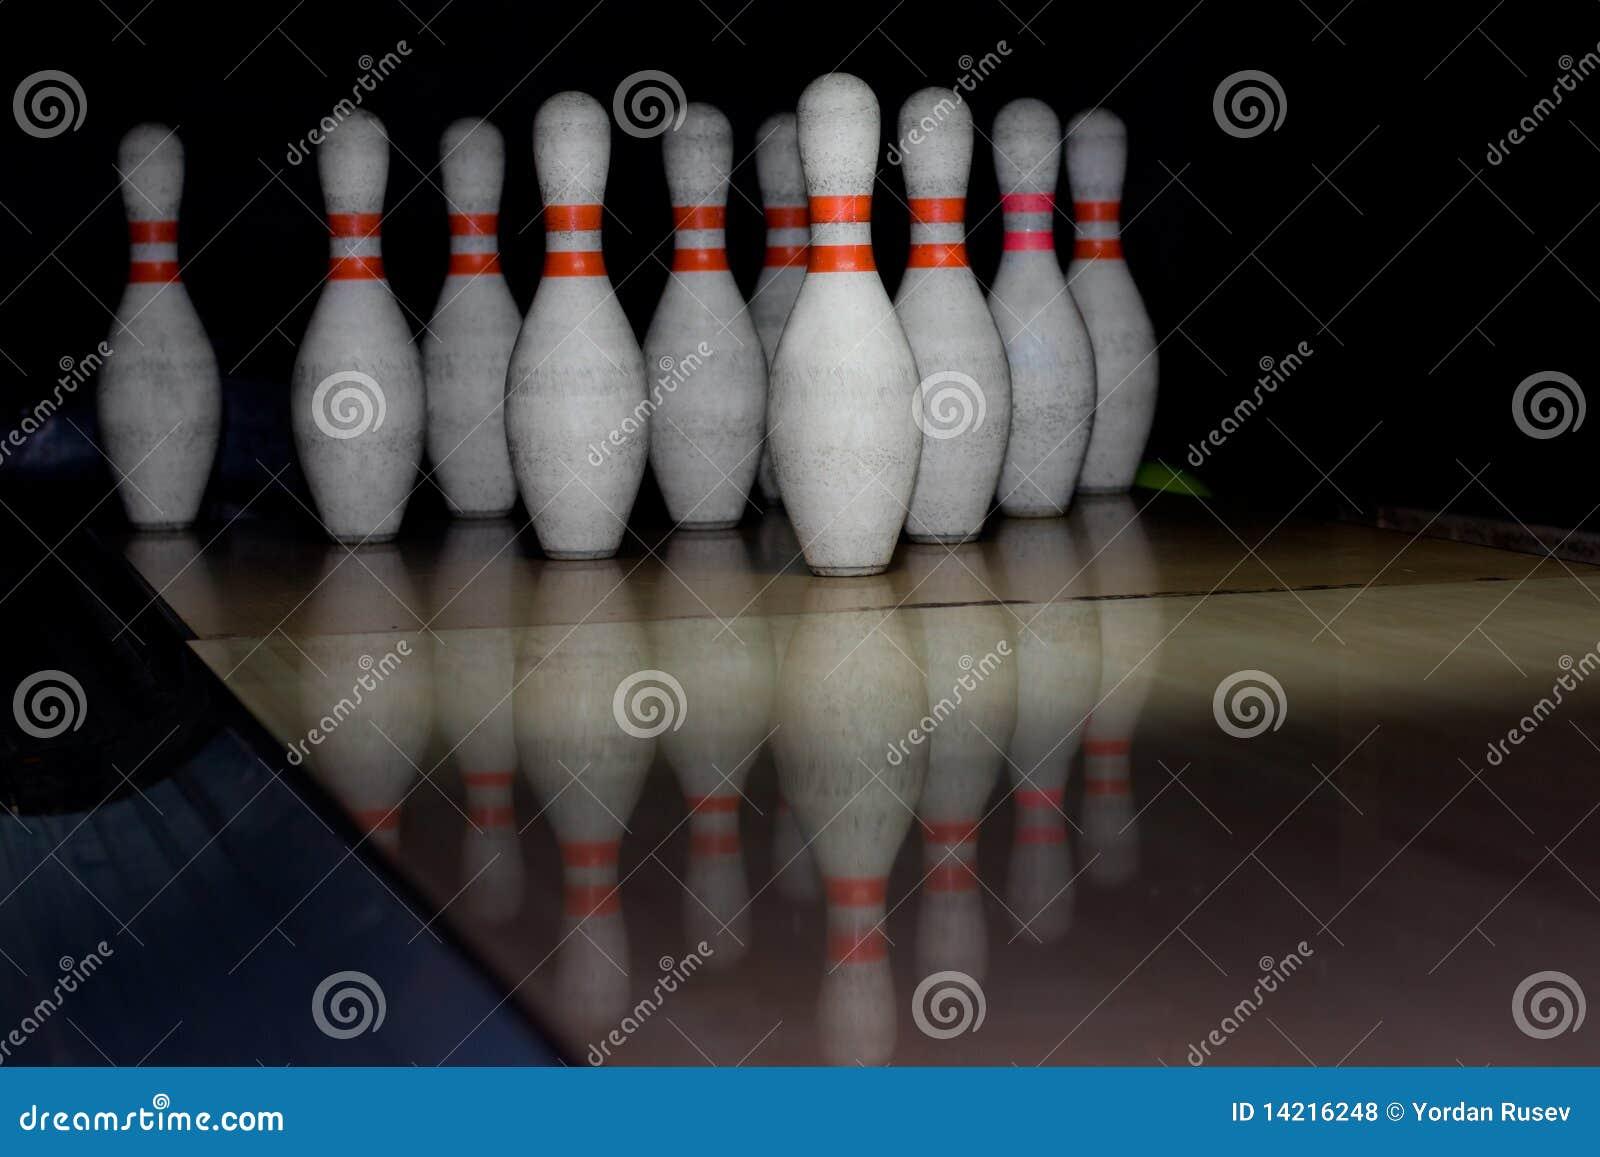 Bowlingstift